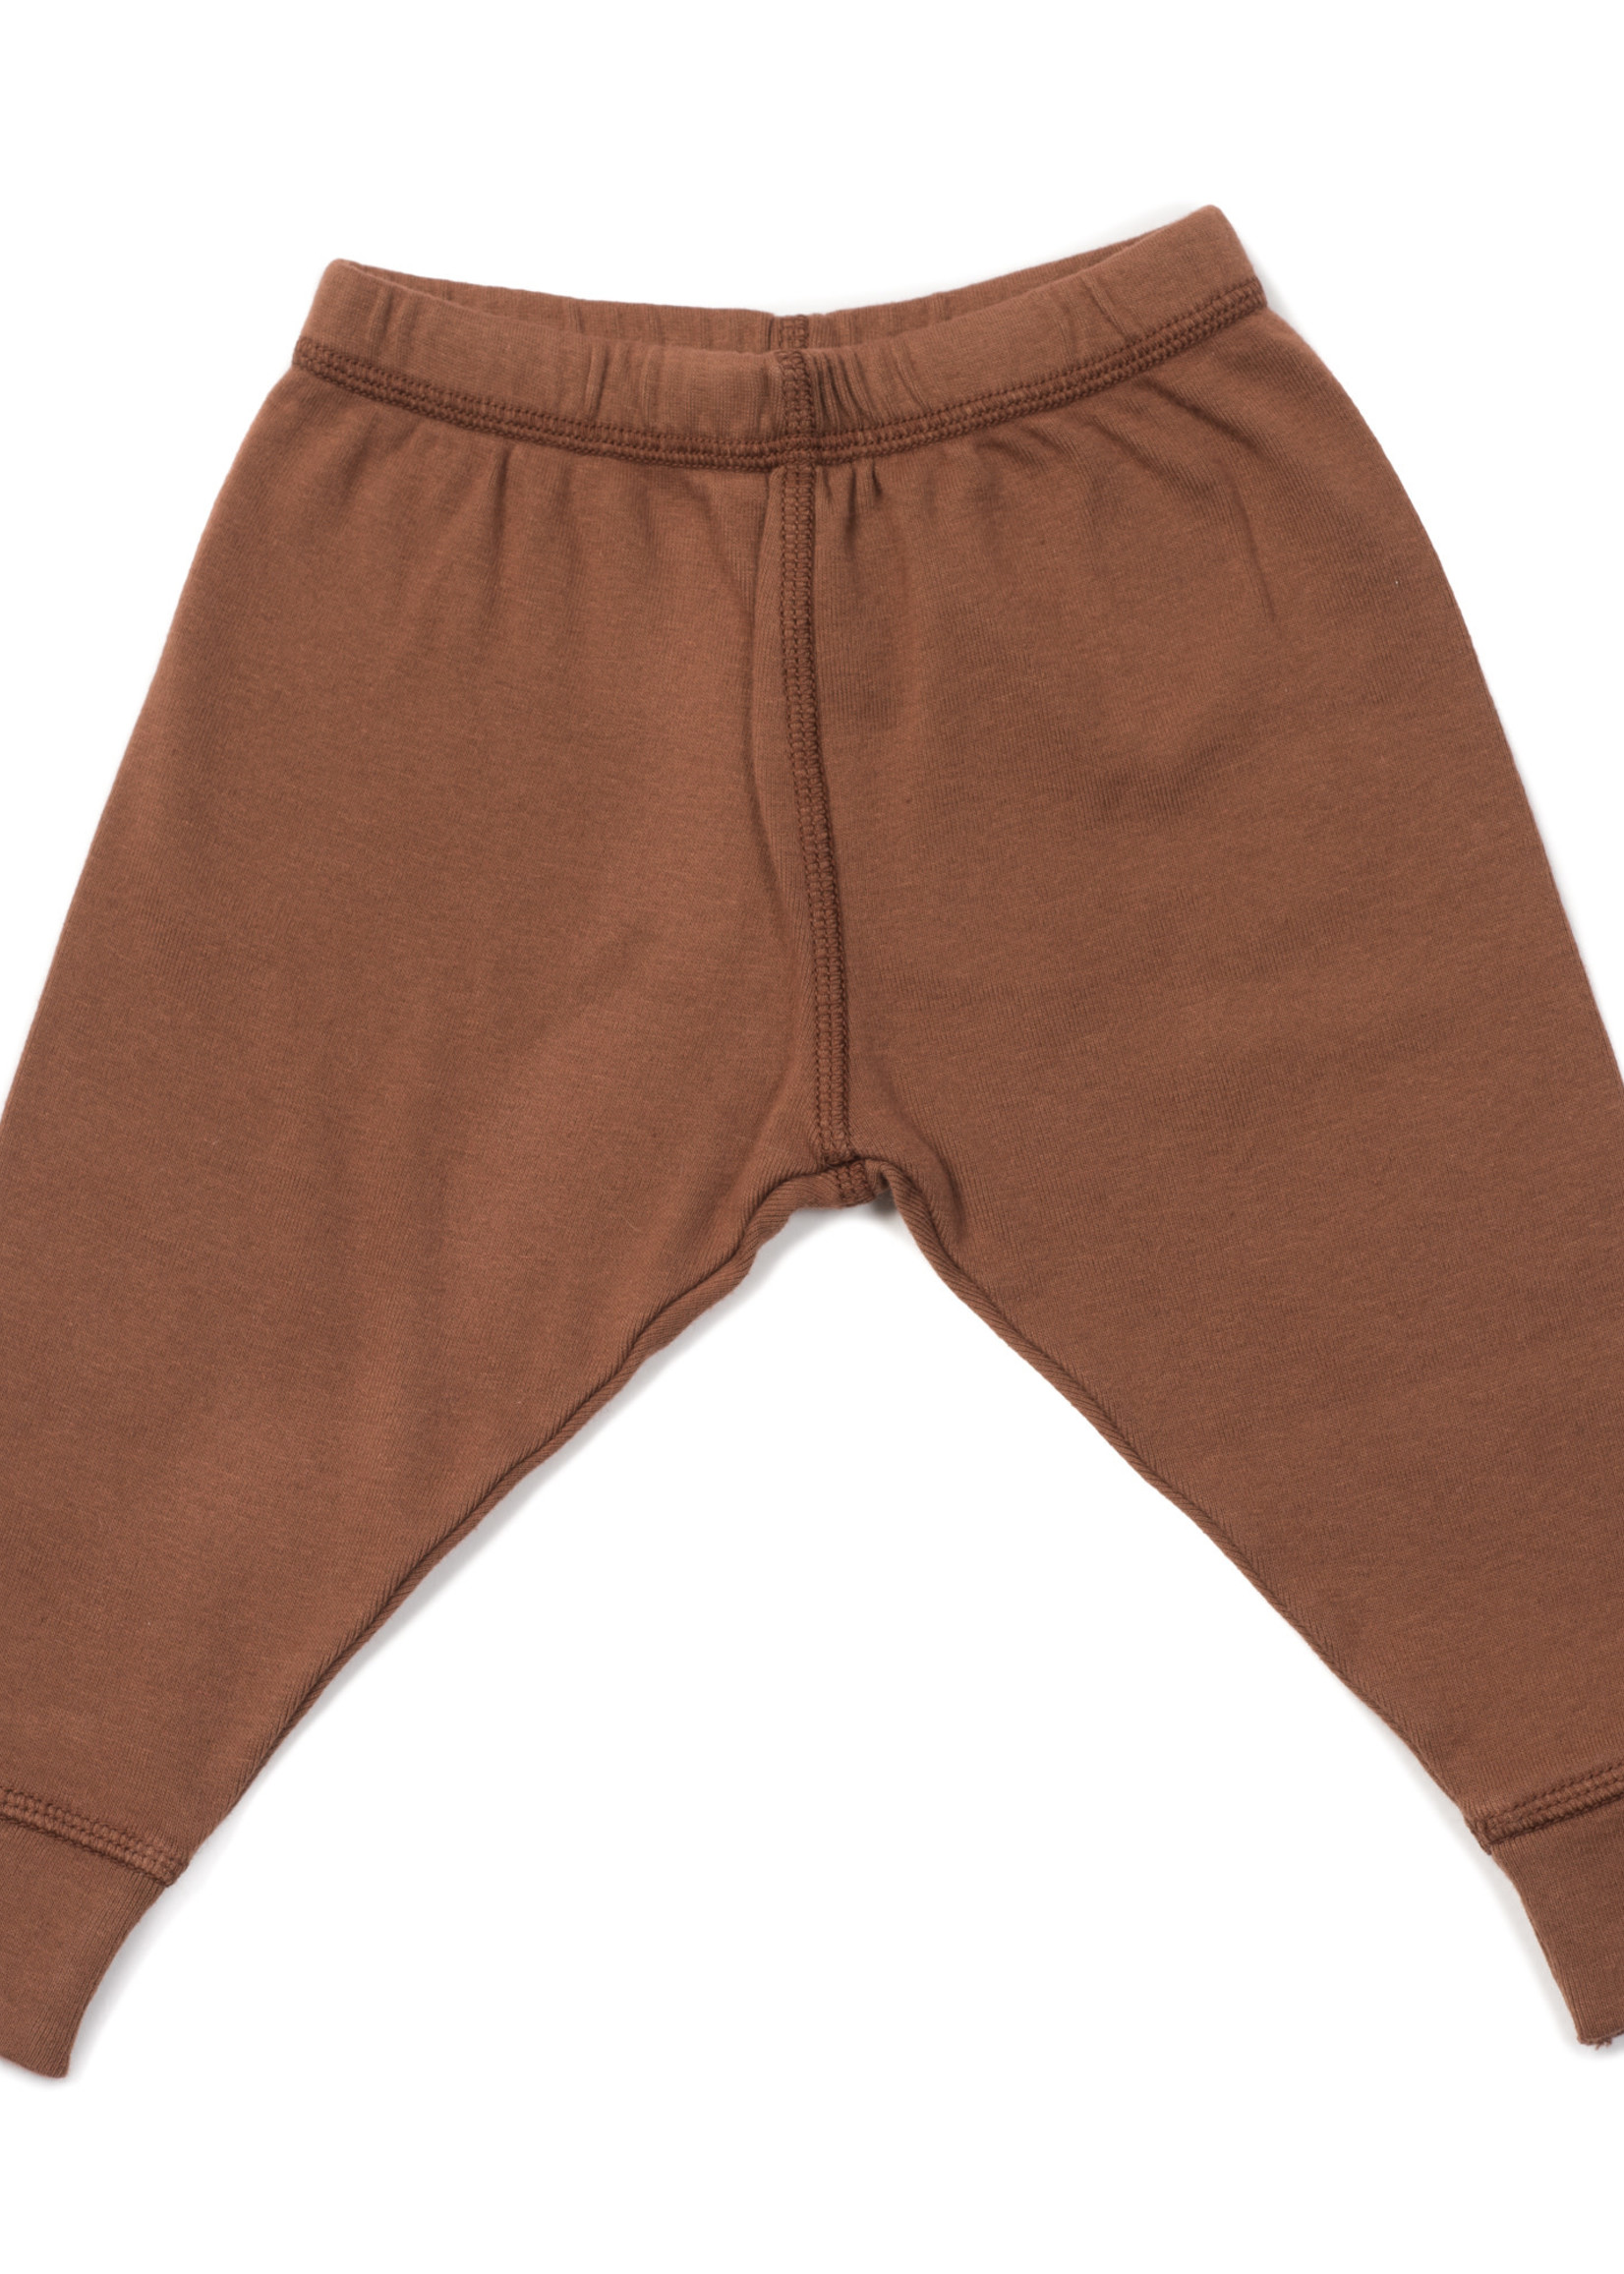 Bonton Bonton baby legging